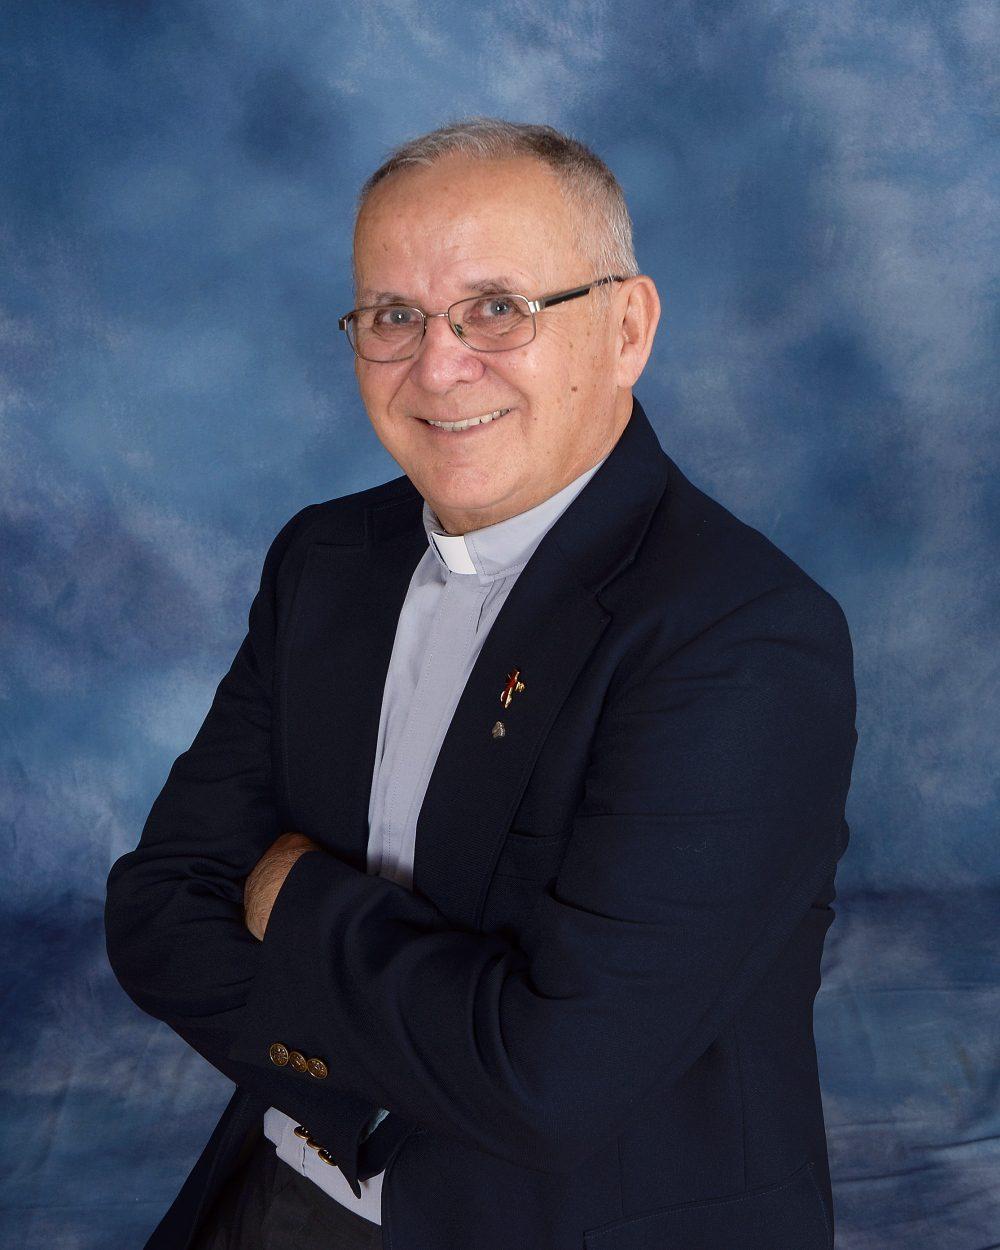 Deacon John Cunningham : Deacon